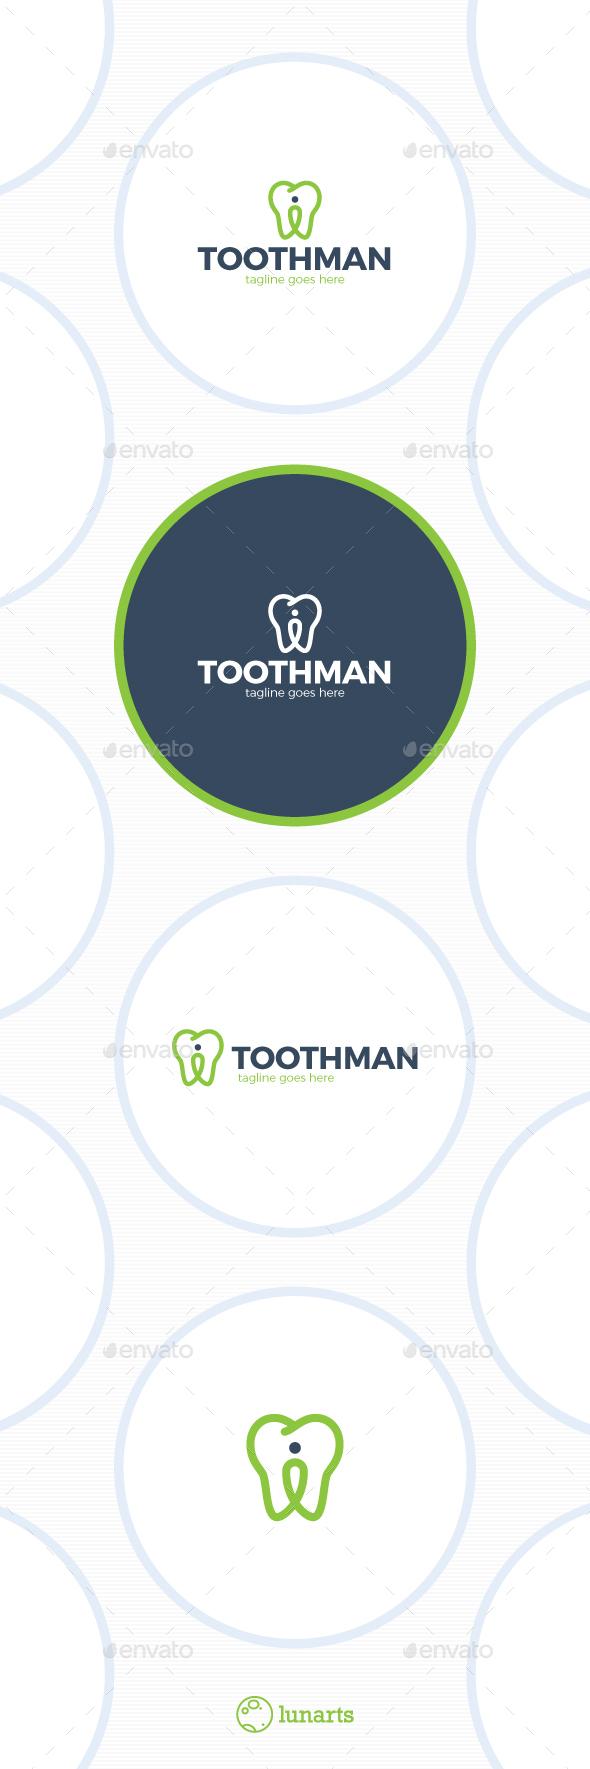 Dental Location Logo - Tooth Pin